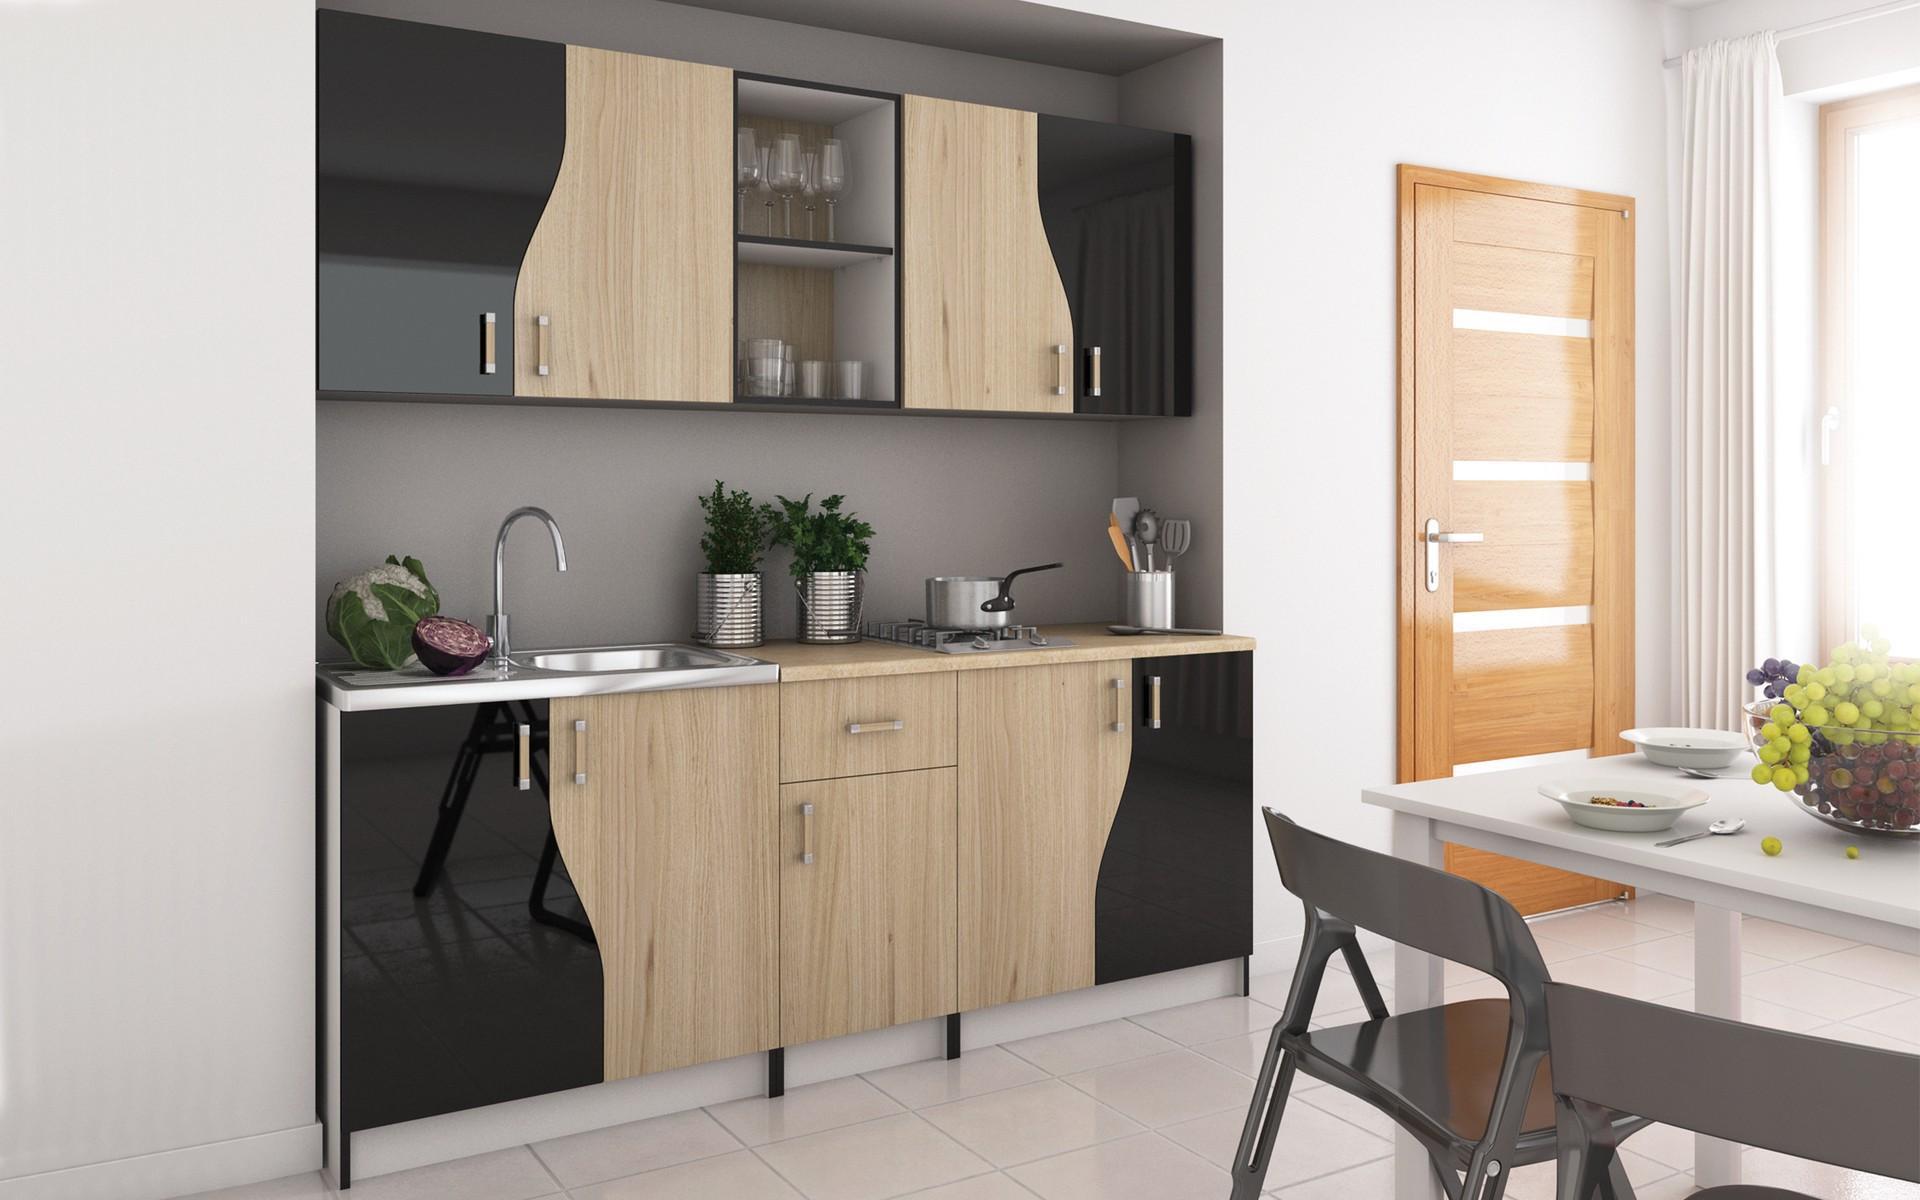 Кухня Слейн, бяла + дъб сонома + черен гланц